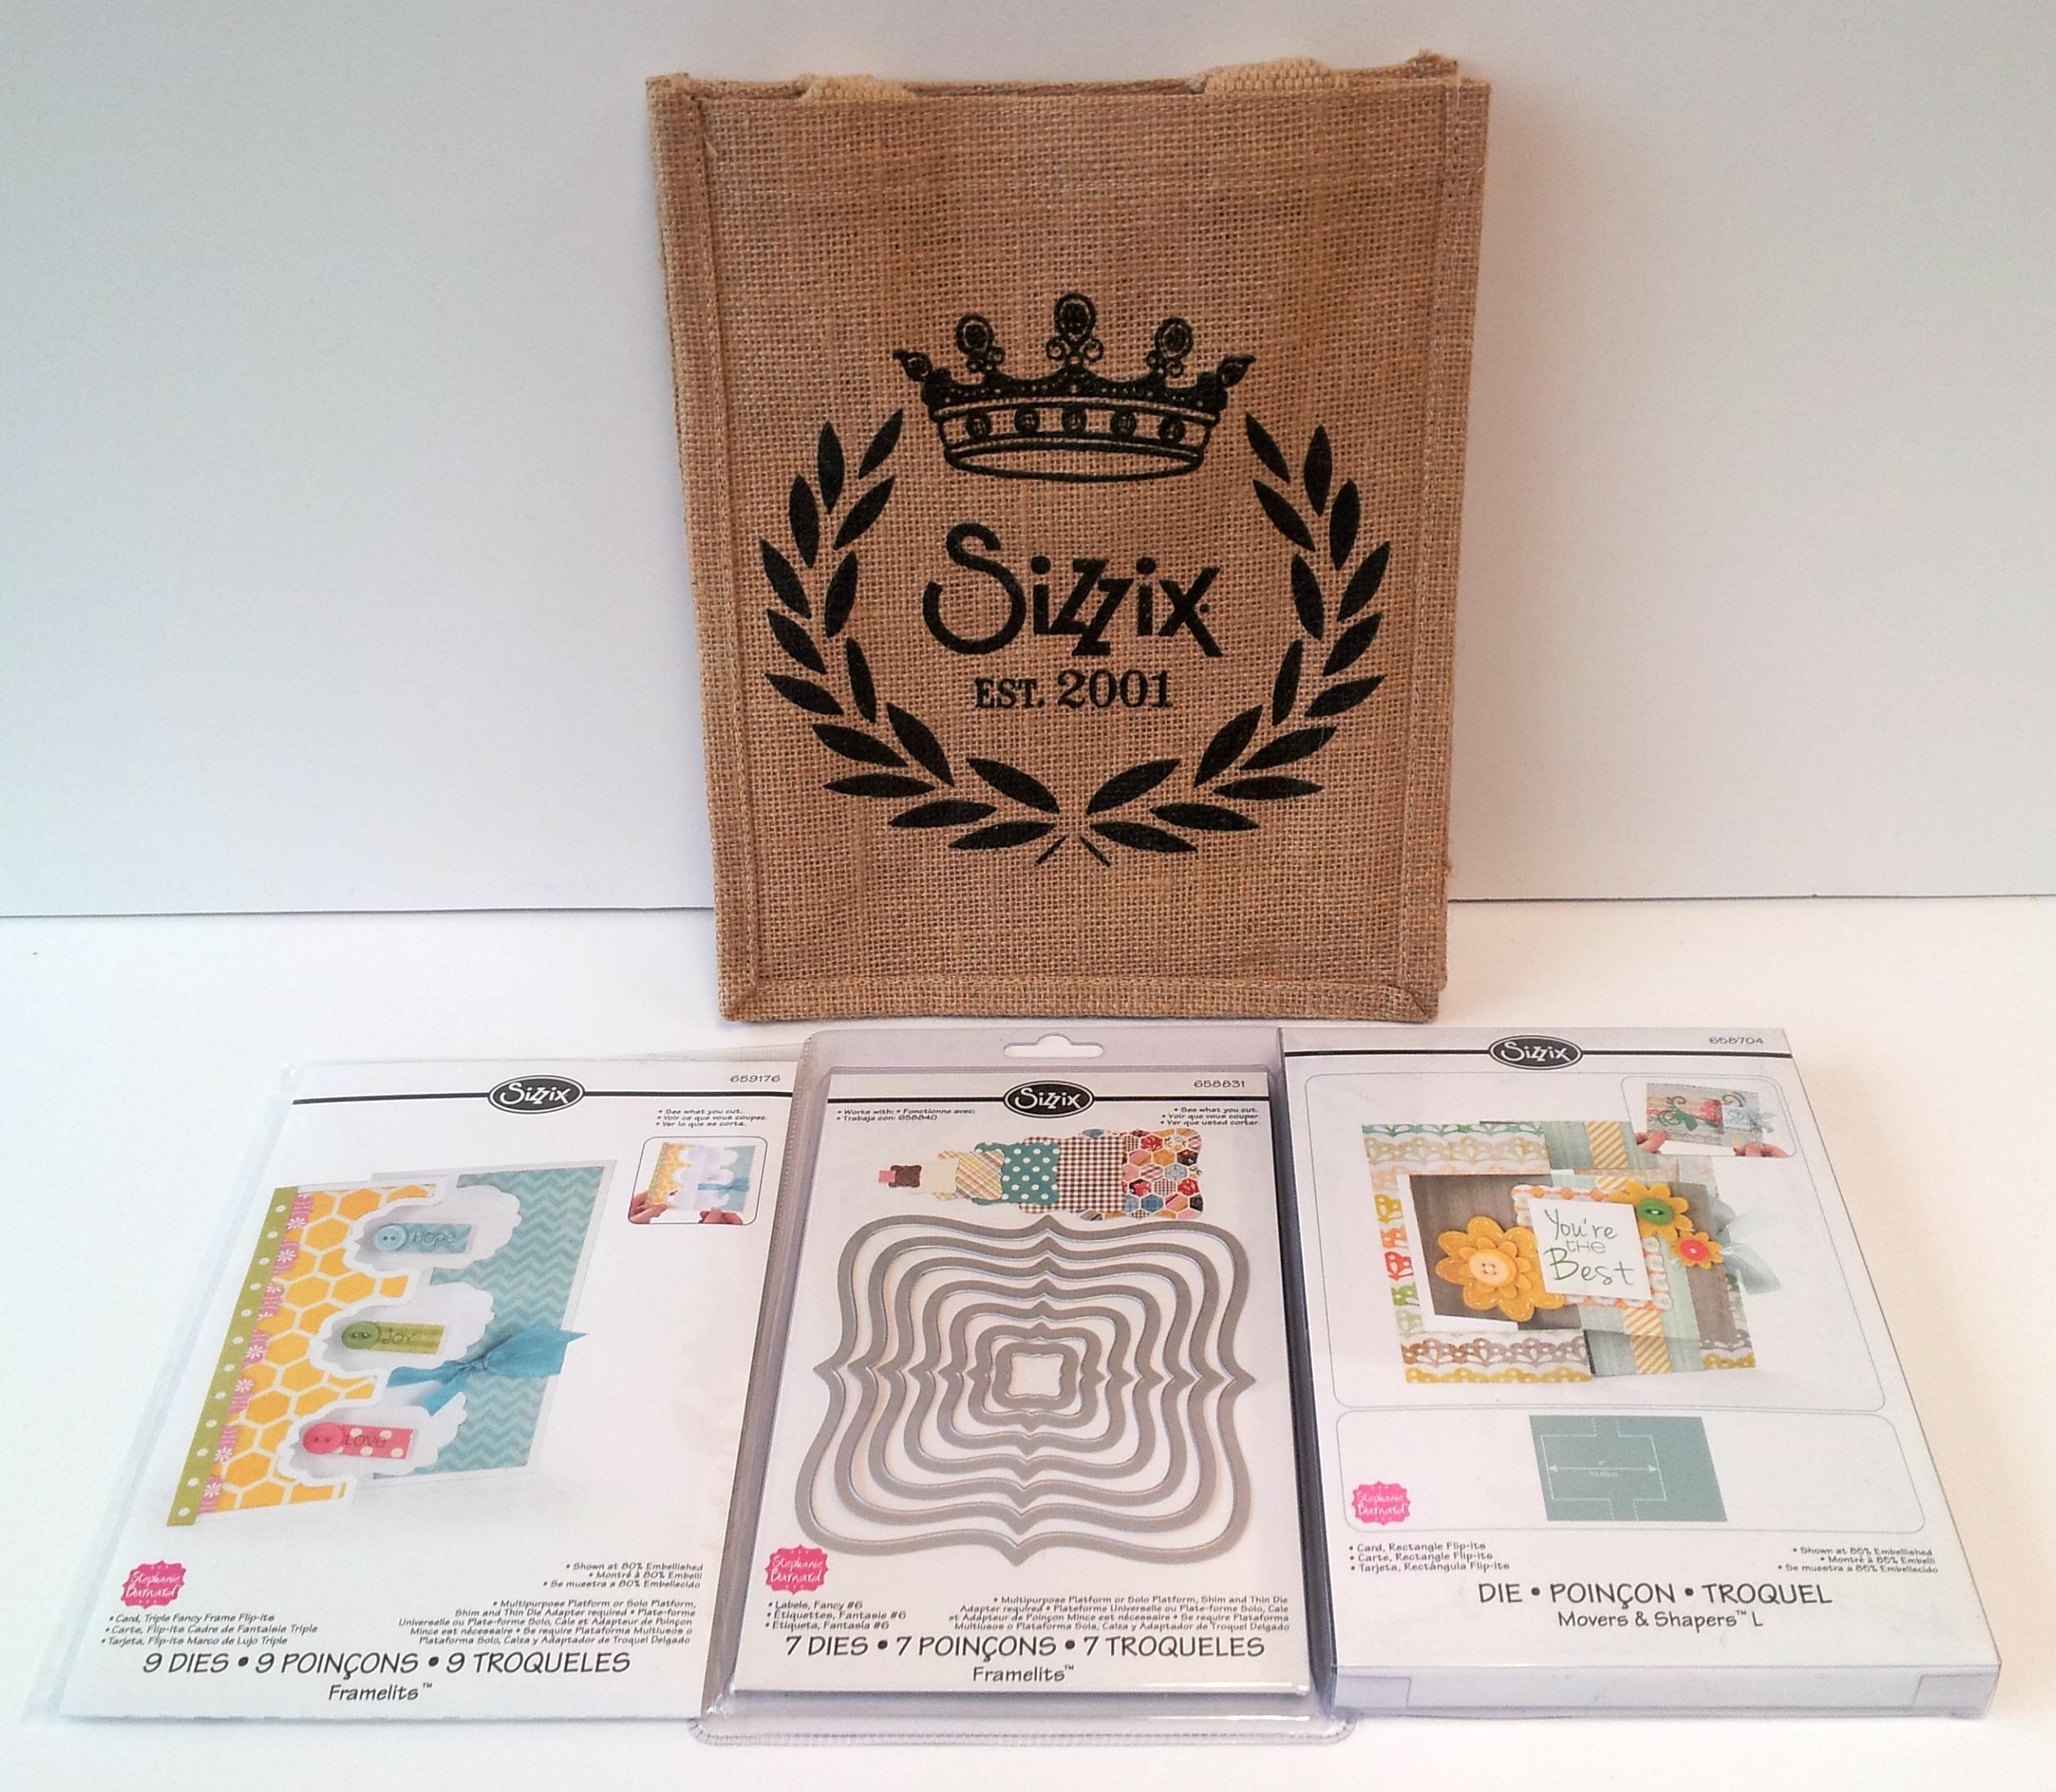 sizzix prize